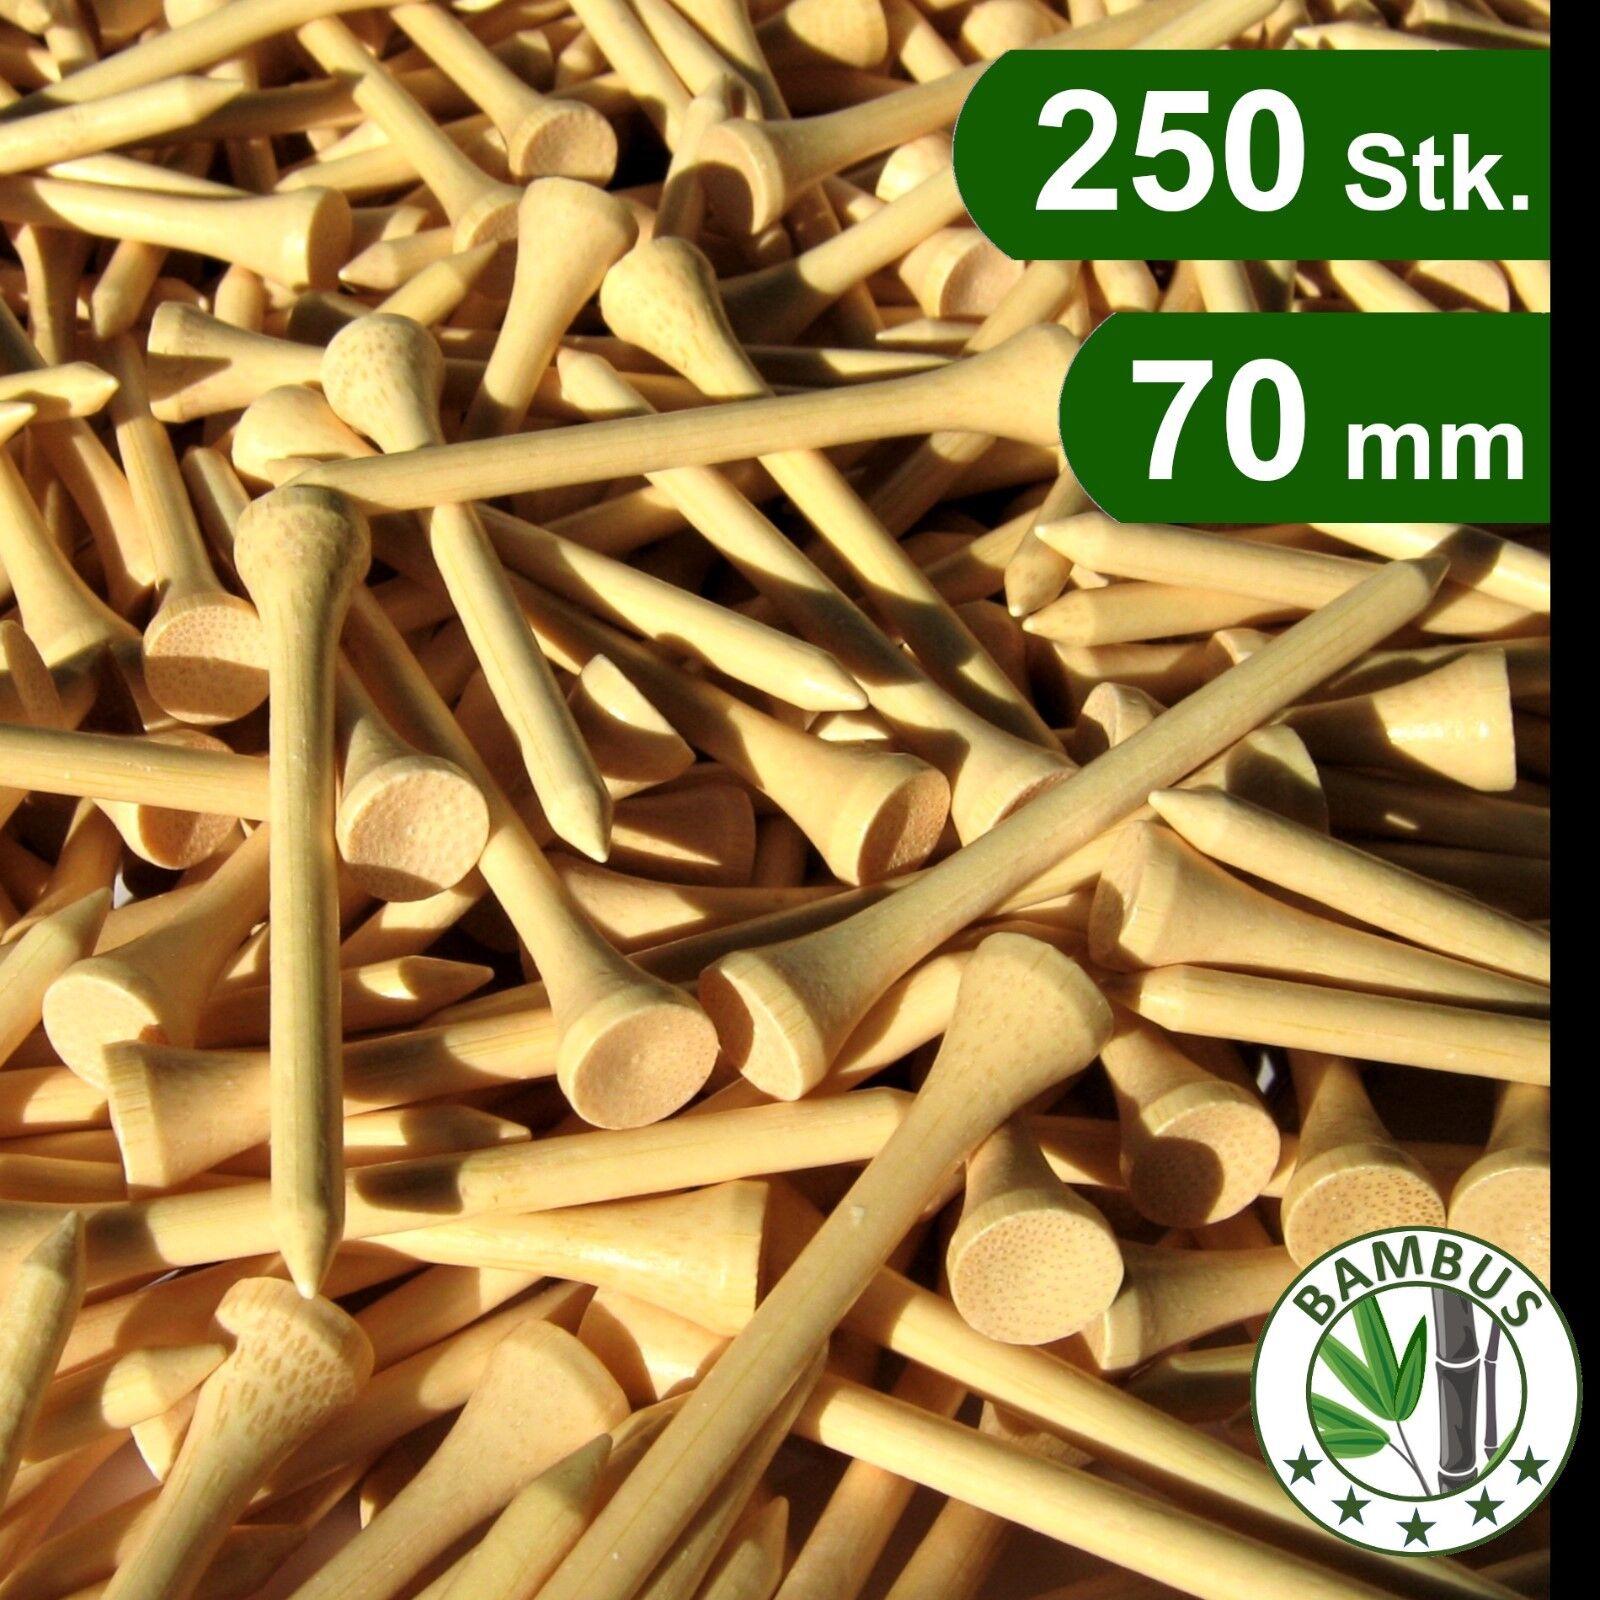 250 Stk / aus BAMBUS / natur / 70 mm - 7,0 cm - 2 3/4 Zoll / Golf Tees / Holz